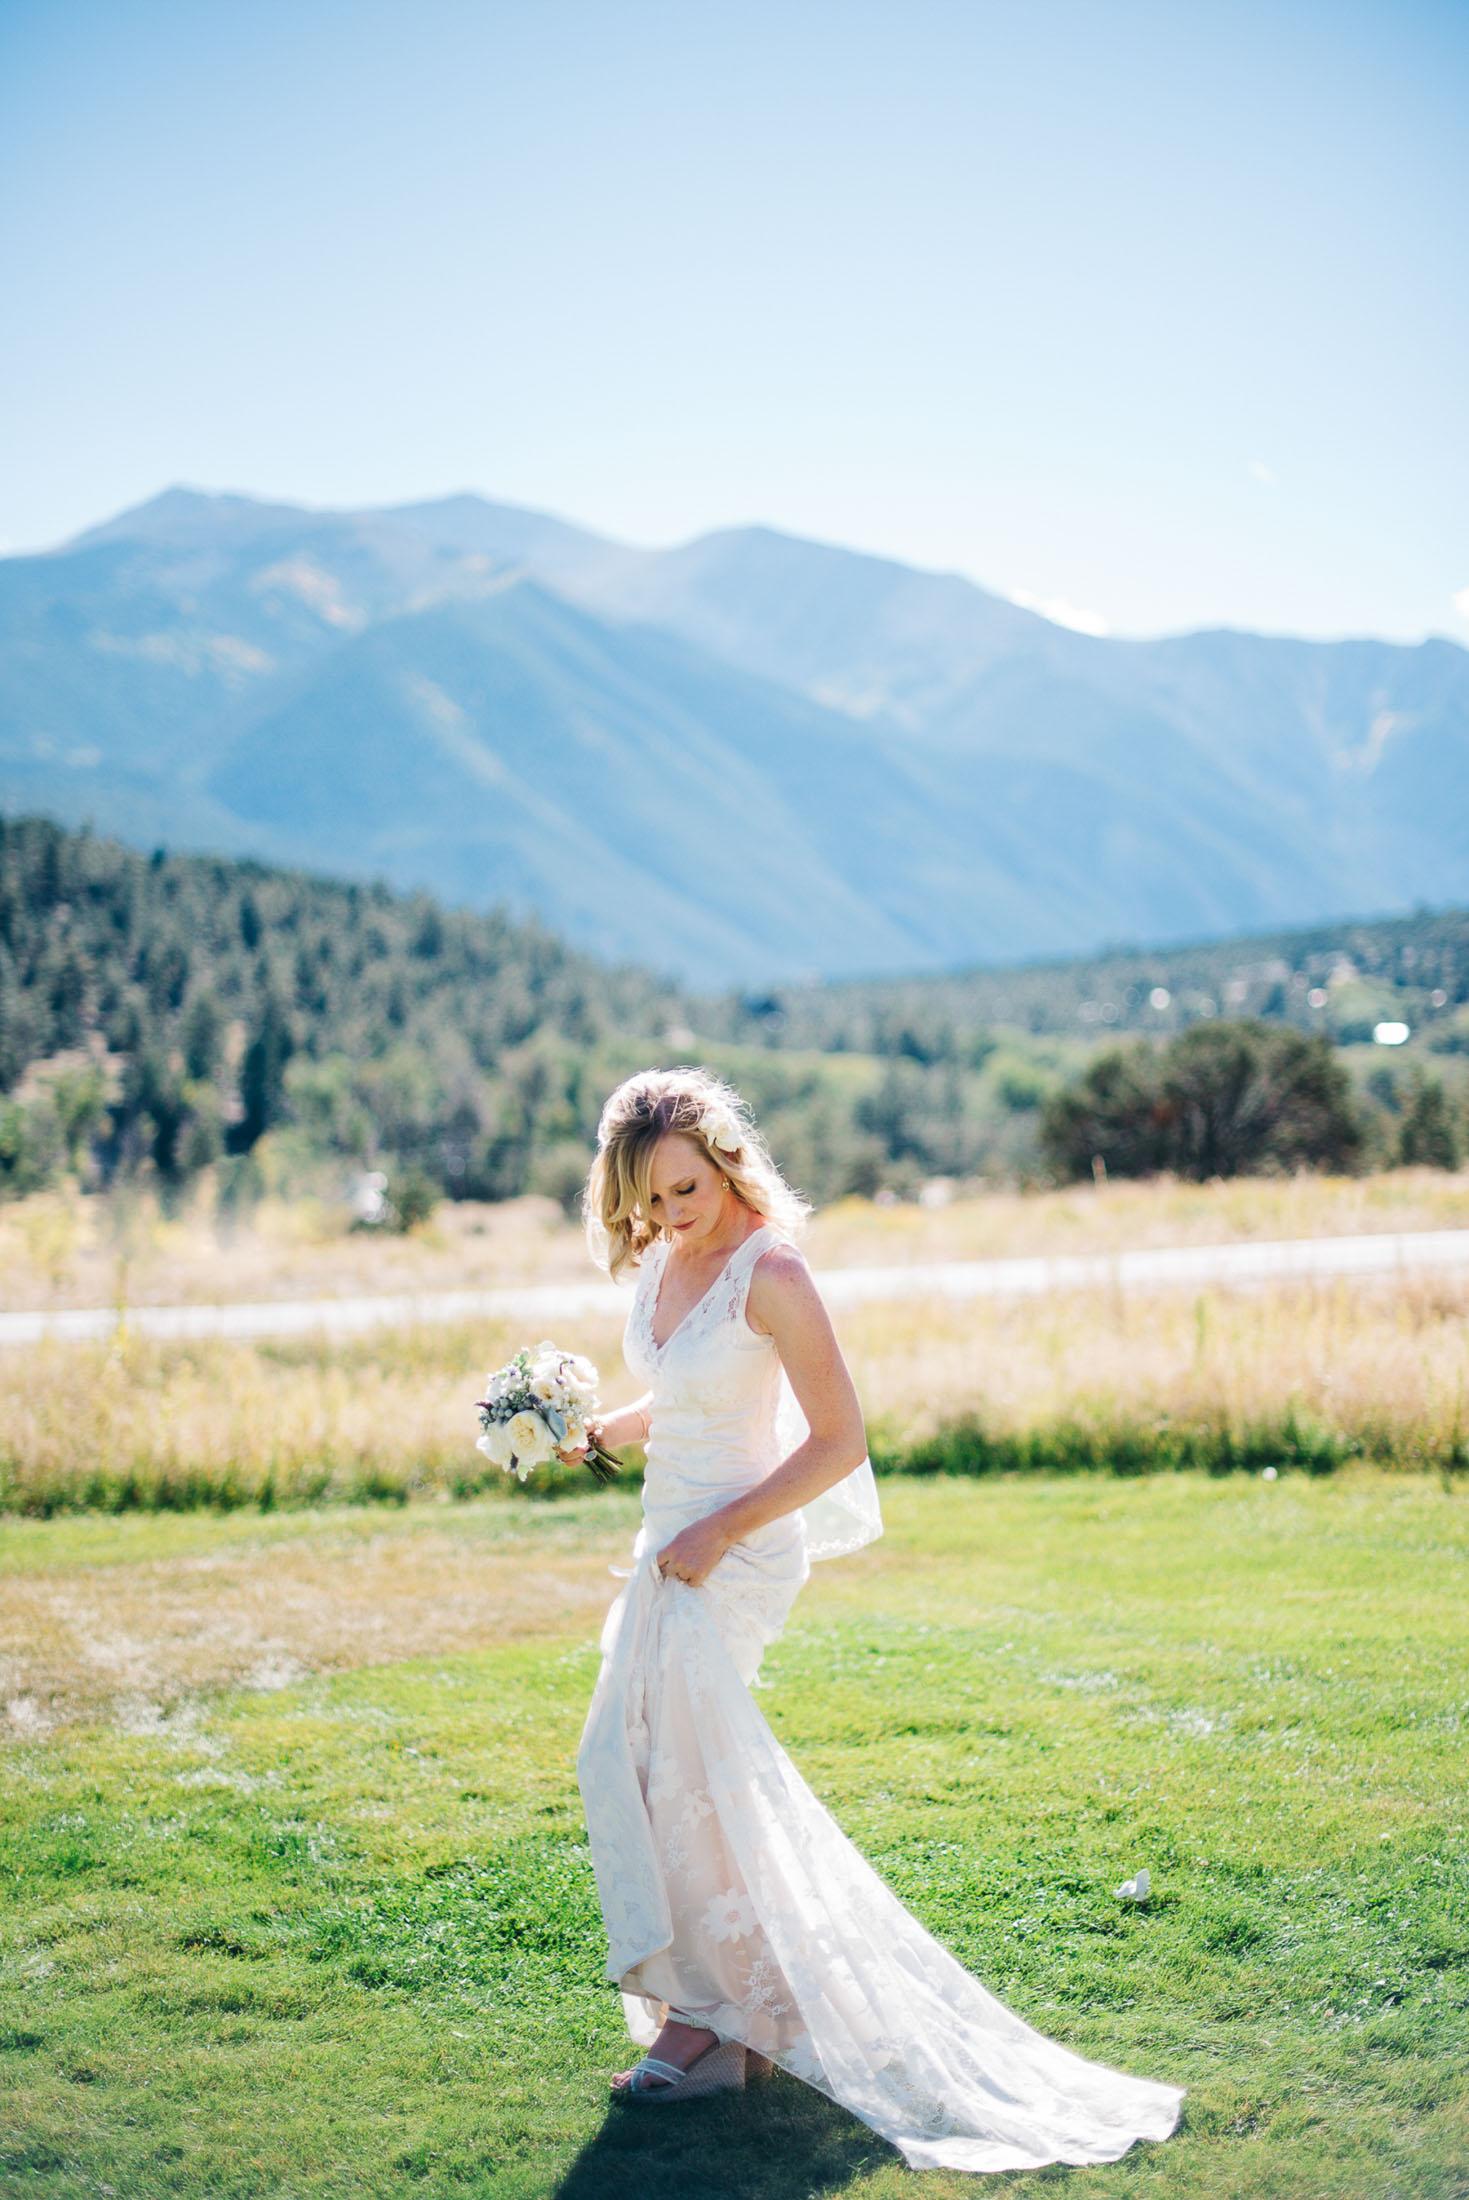 48elopement-photographer-colorado-mount_princeton_mountain_wedding_photographer_jessica&geoff0542.jpg